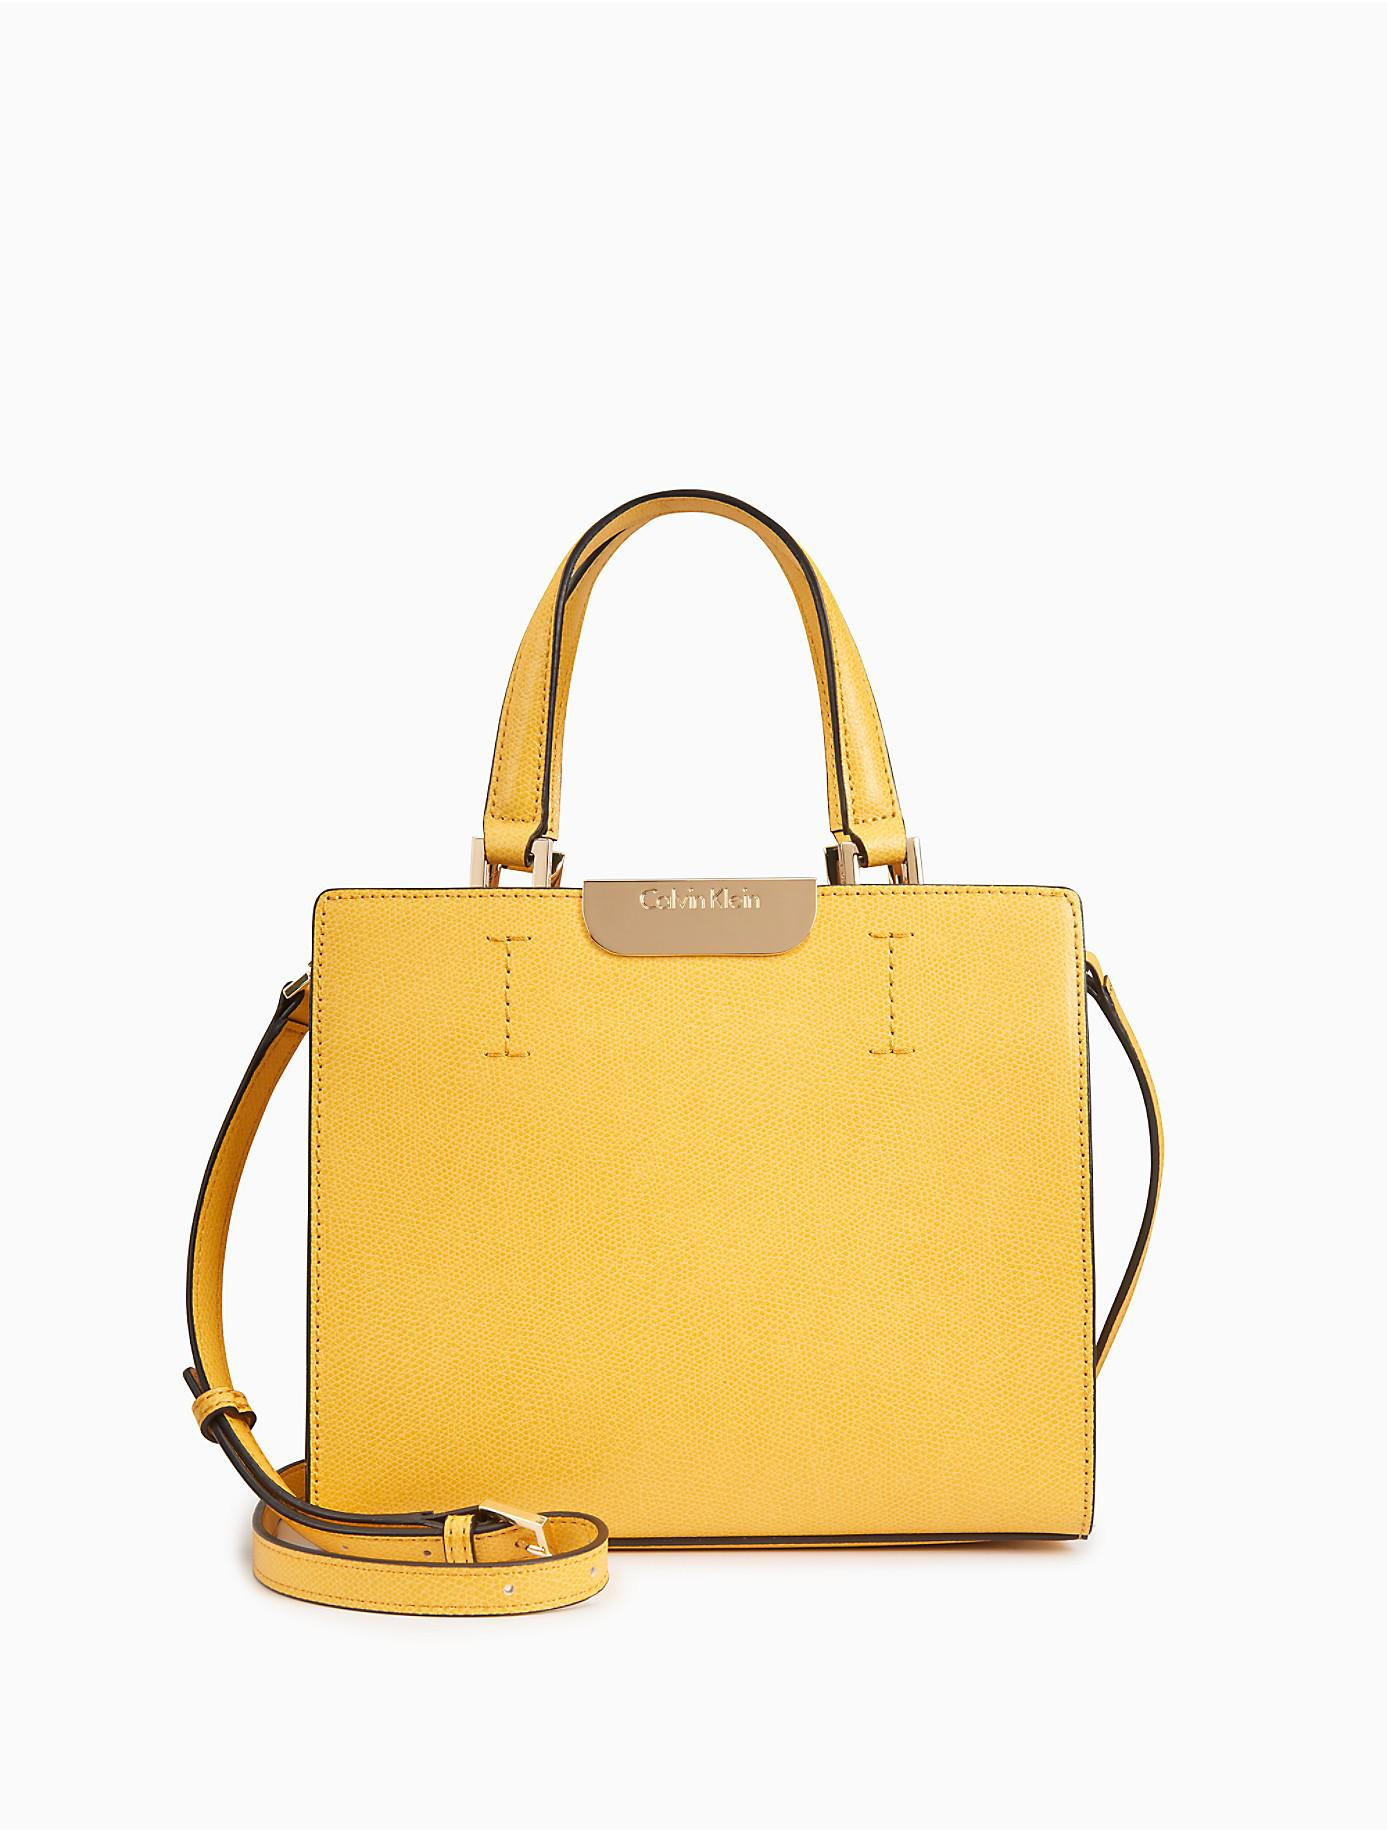 1ee6e8dbbf Lyst - Calvin Klein Saffiano Leather Crossbody Bag in Yellow